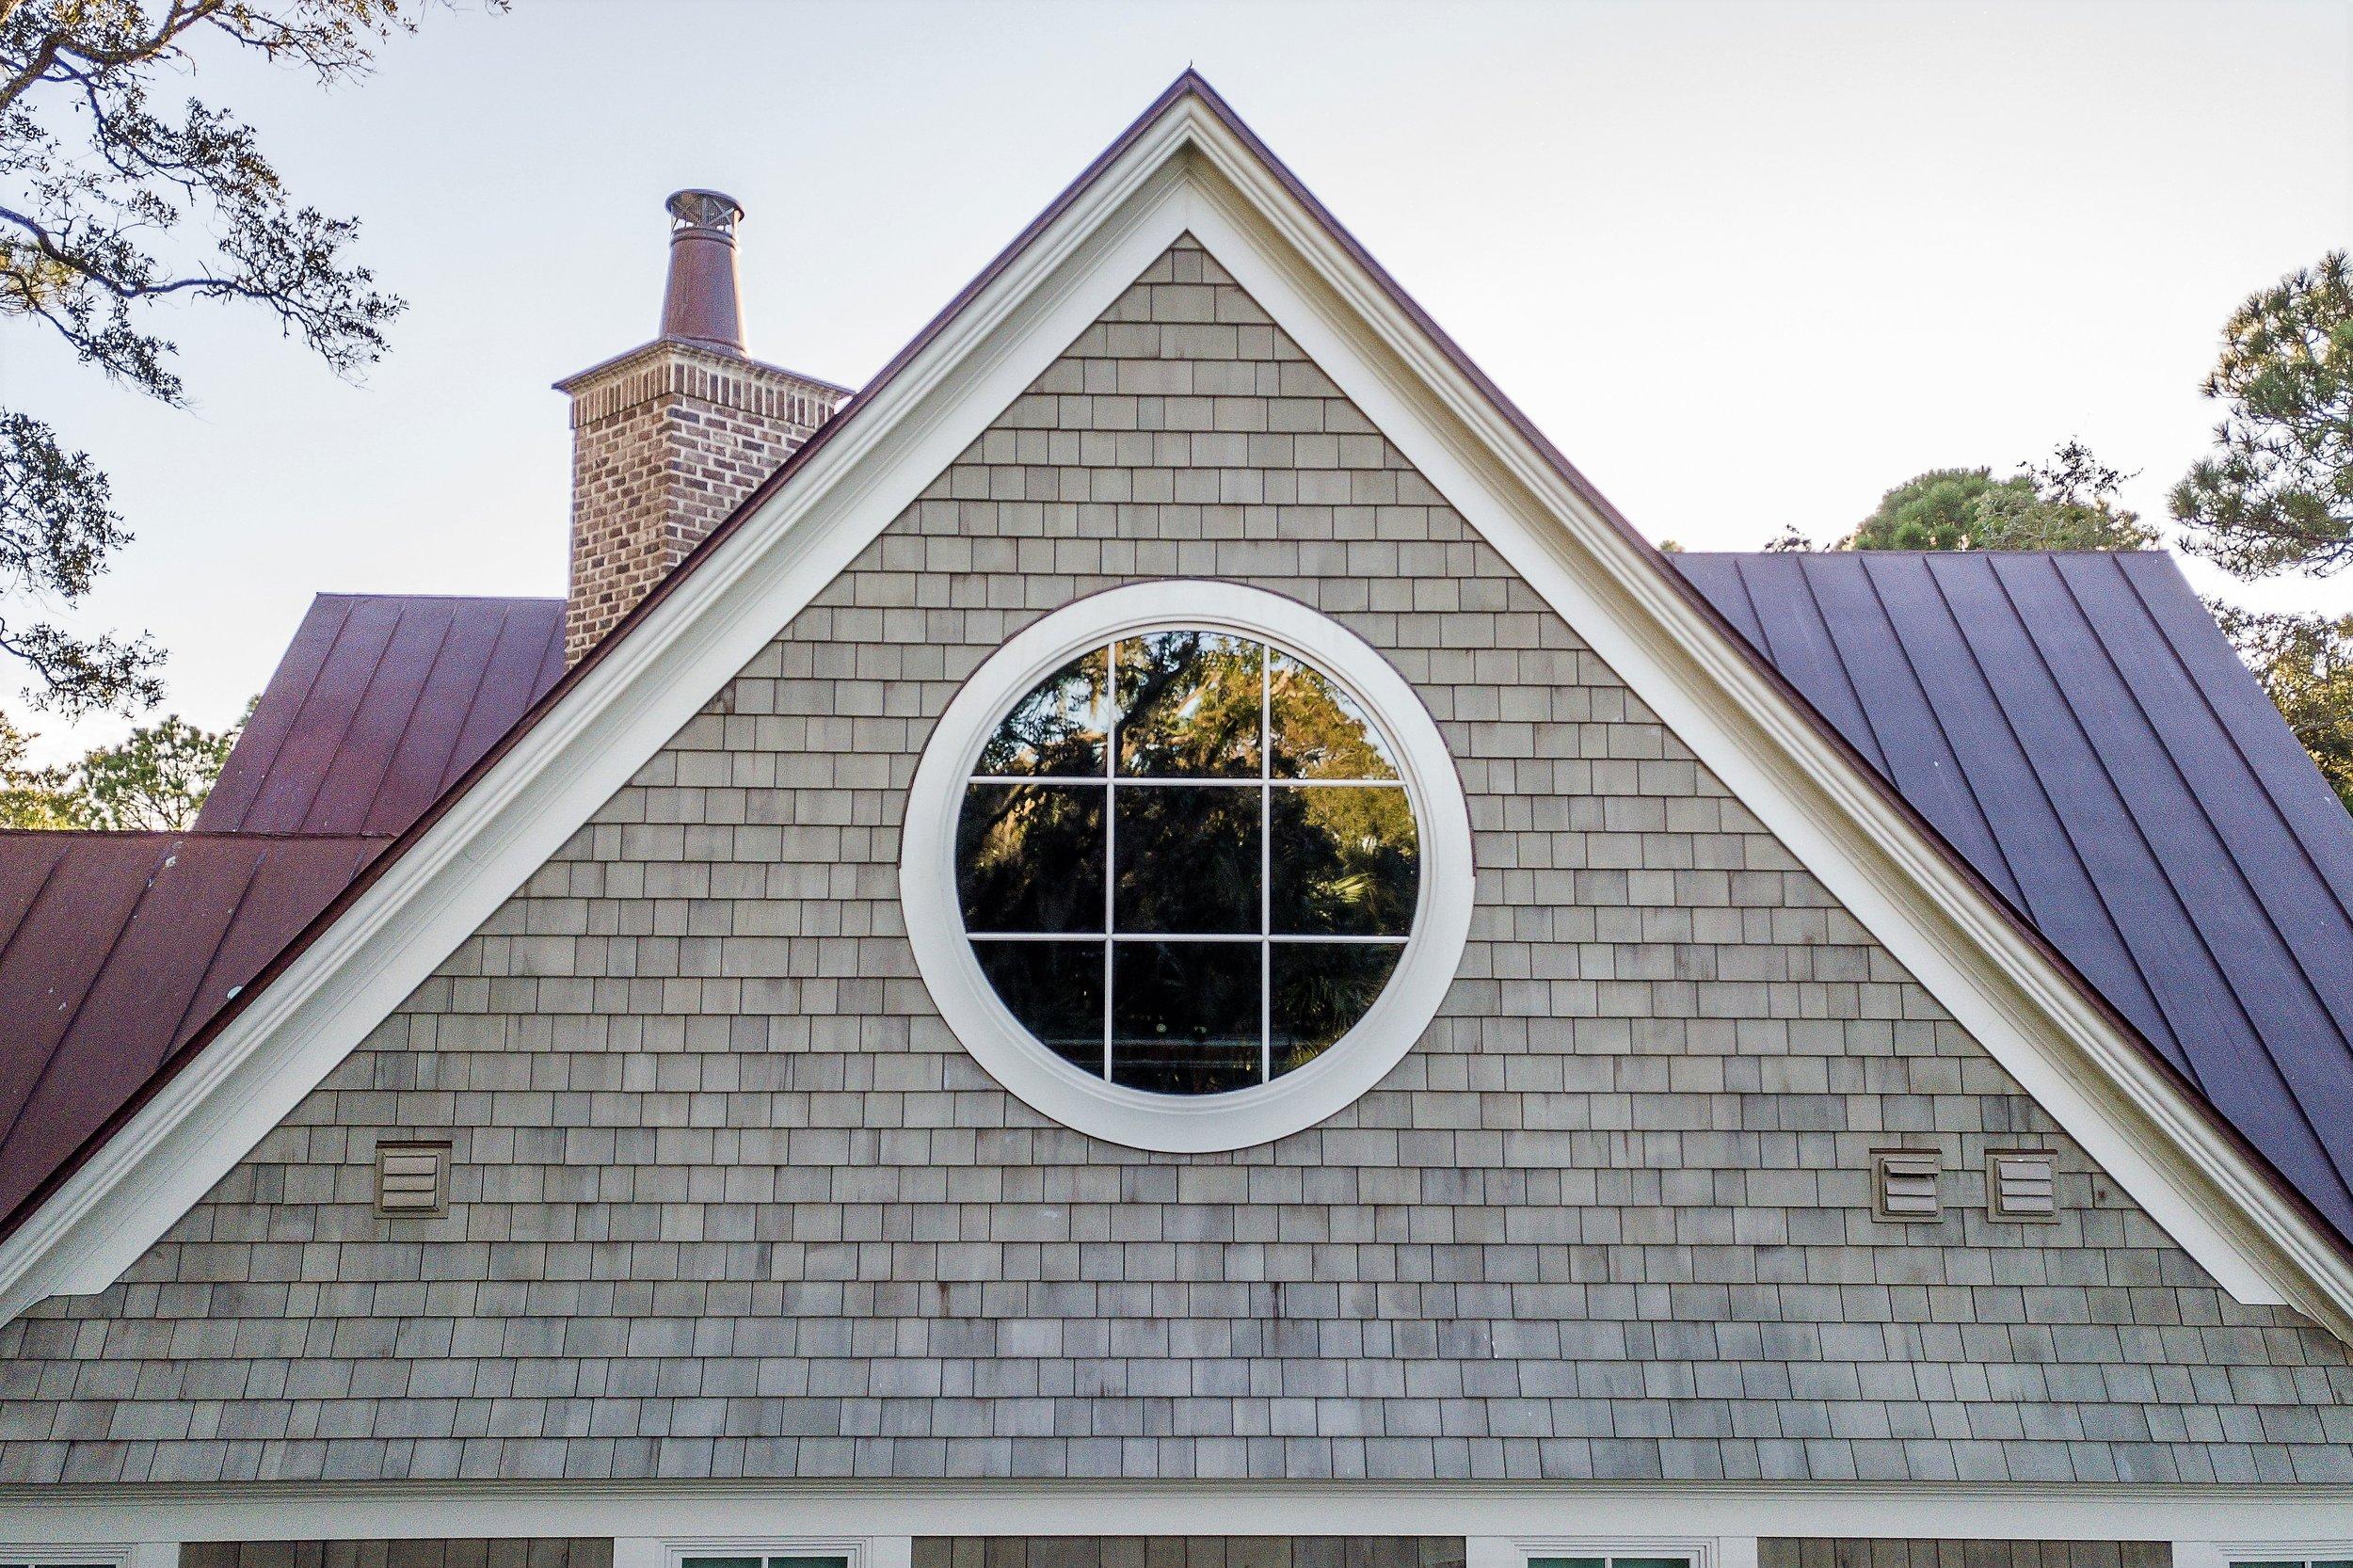 181116-Kiawah-Architecture-Photographer-0186.jpg